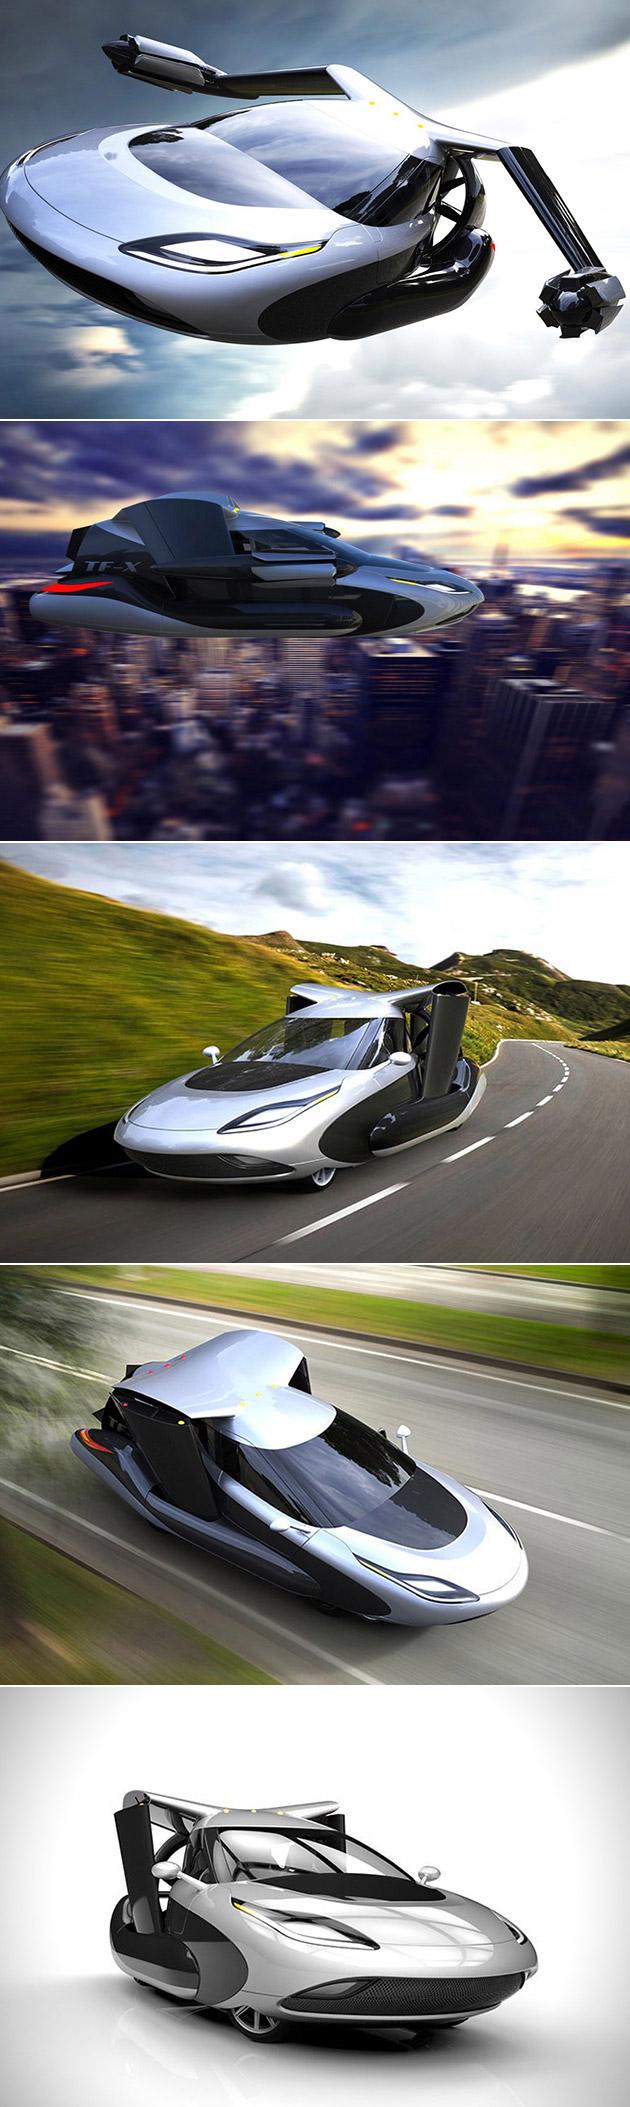 terrafugiatfx-flyingcar